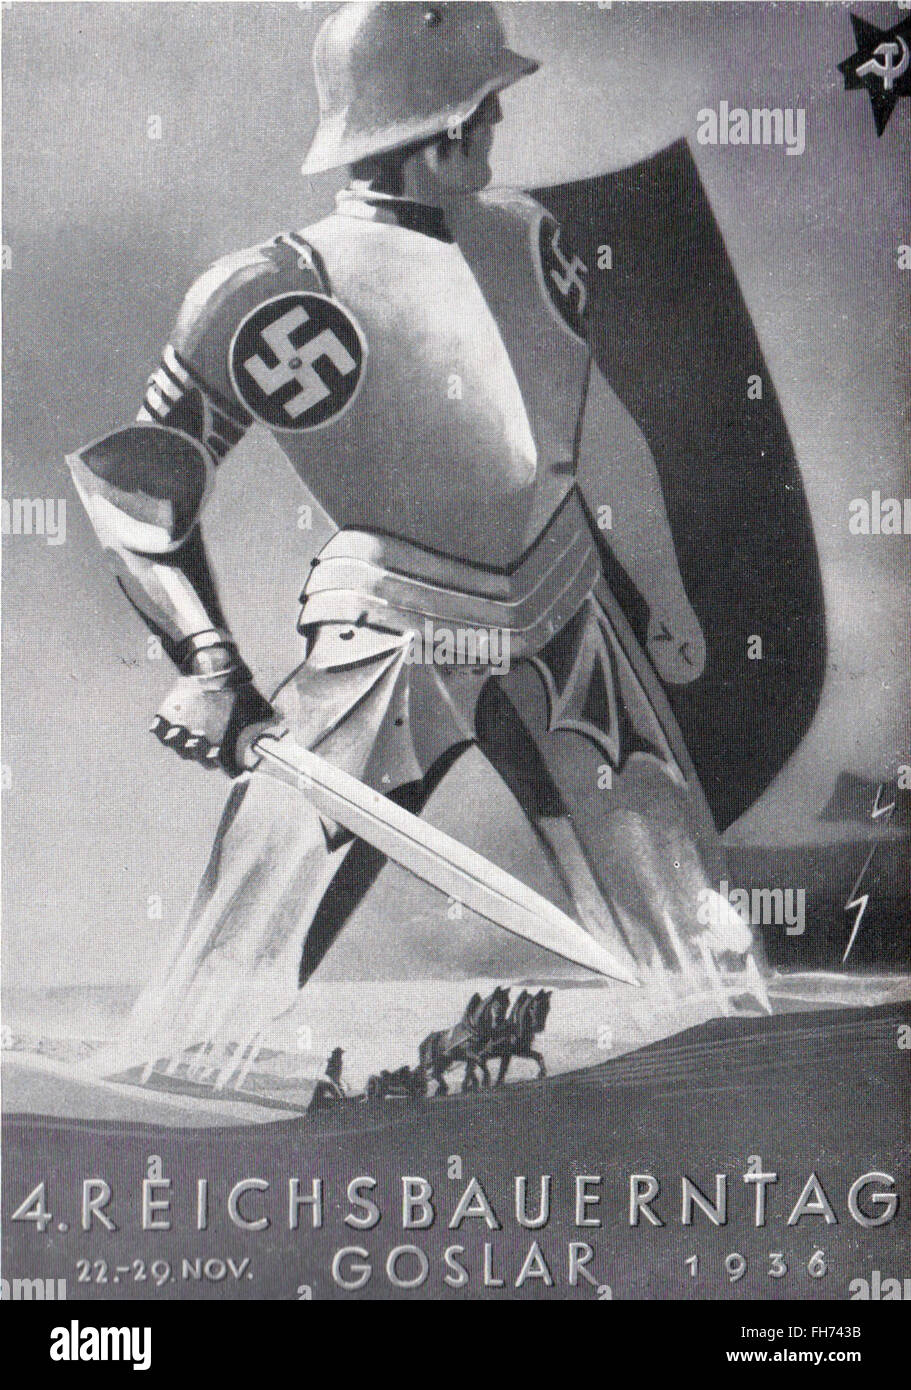 Reichsbauerntag - Affiches de propagande nazi allemand - 1936 Banque D'Images